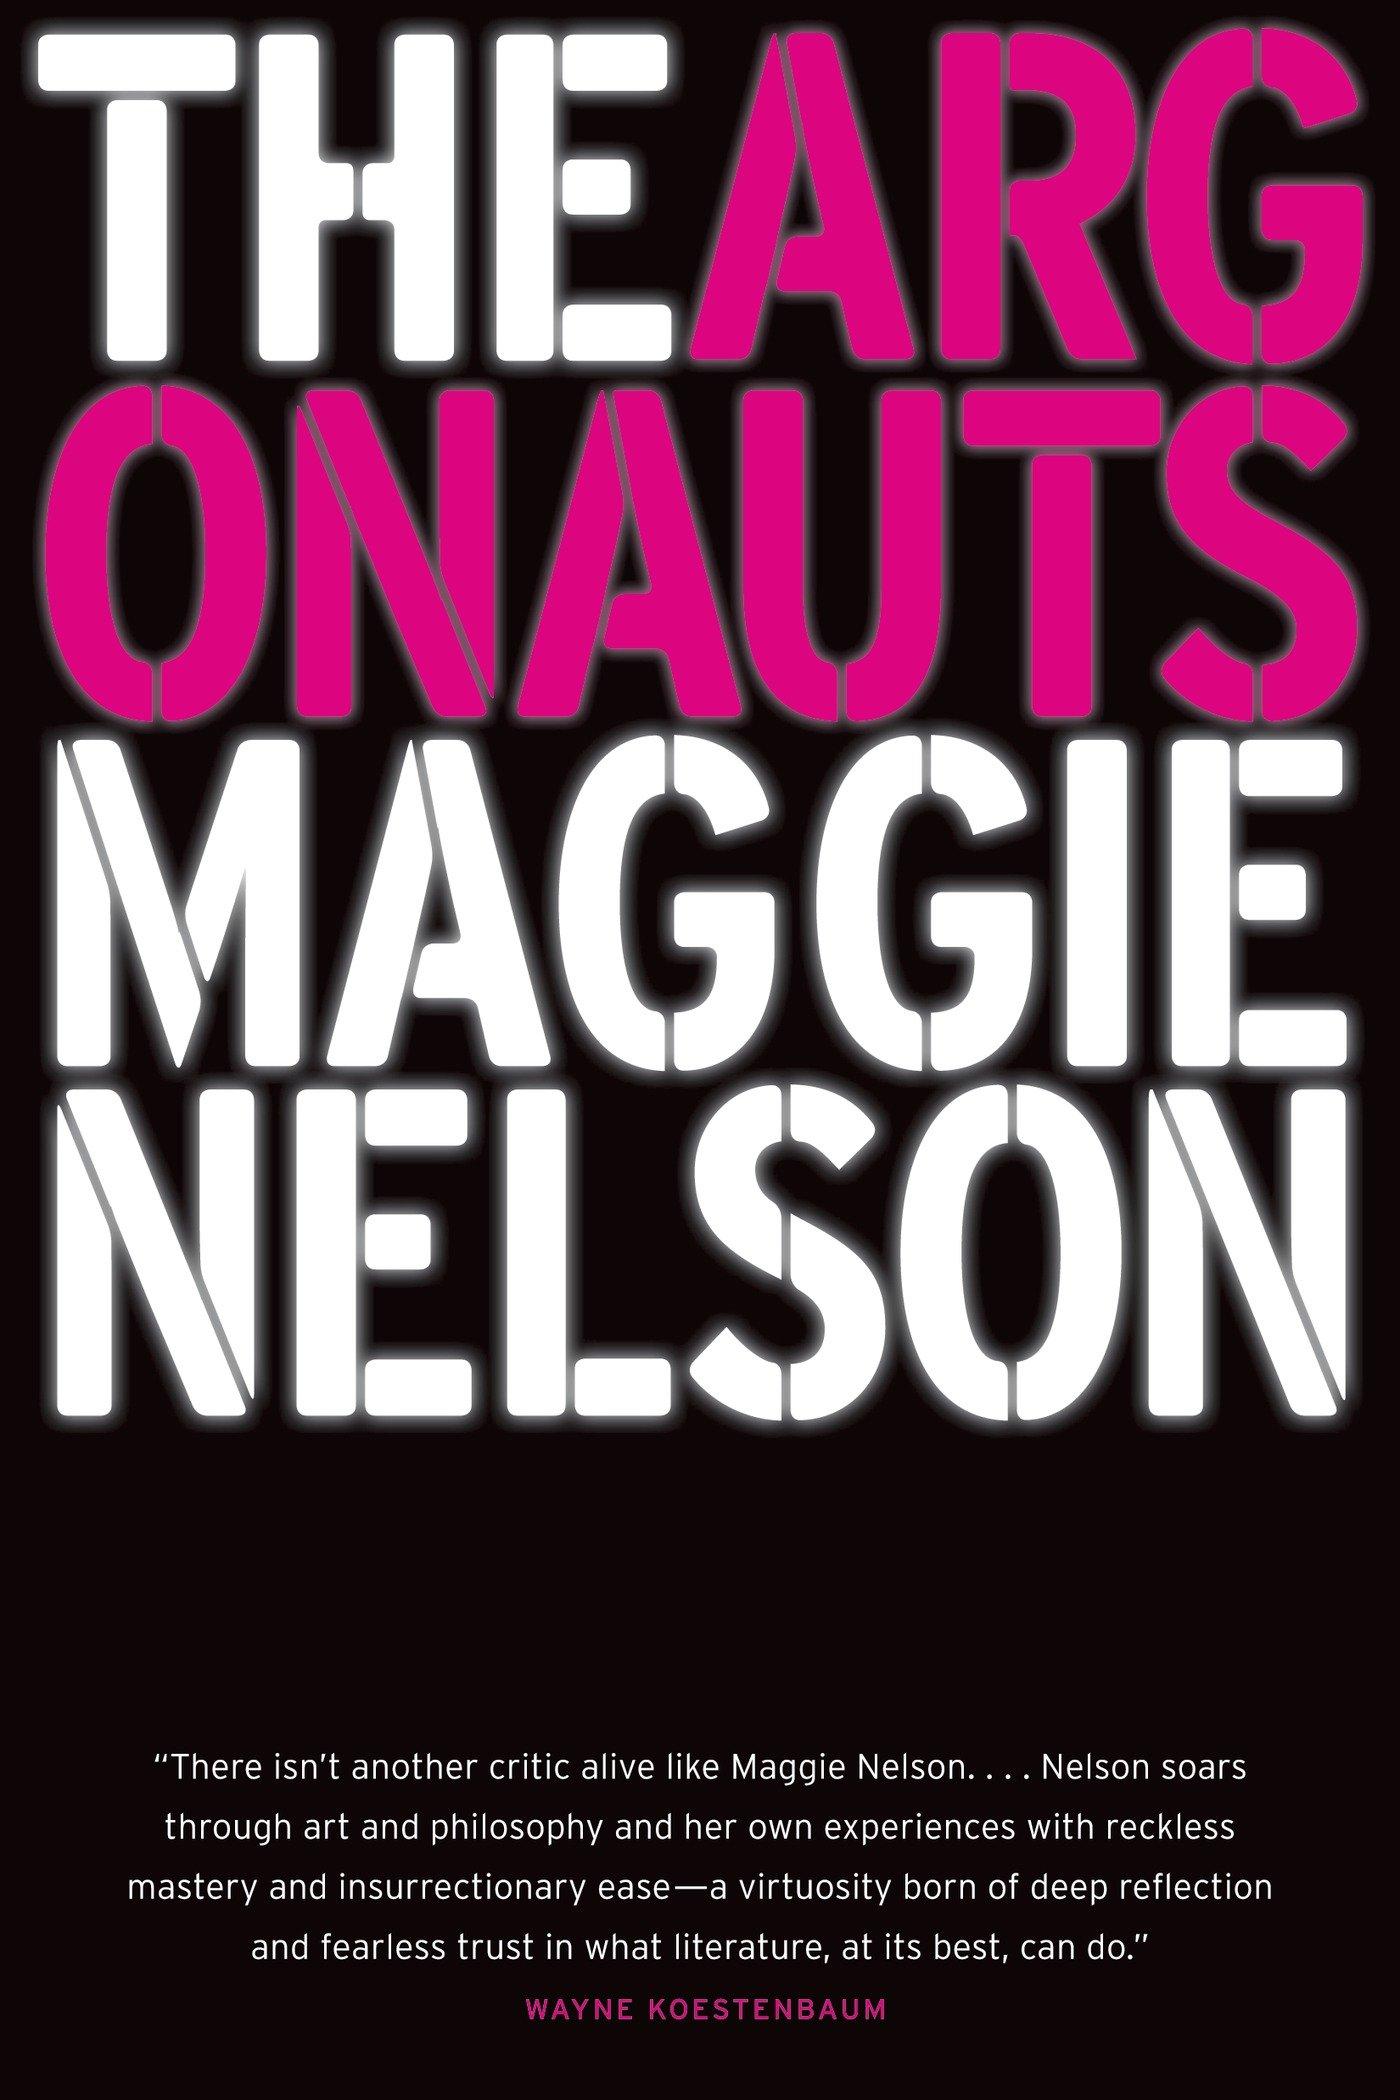 the argonauts, maggie nelson